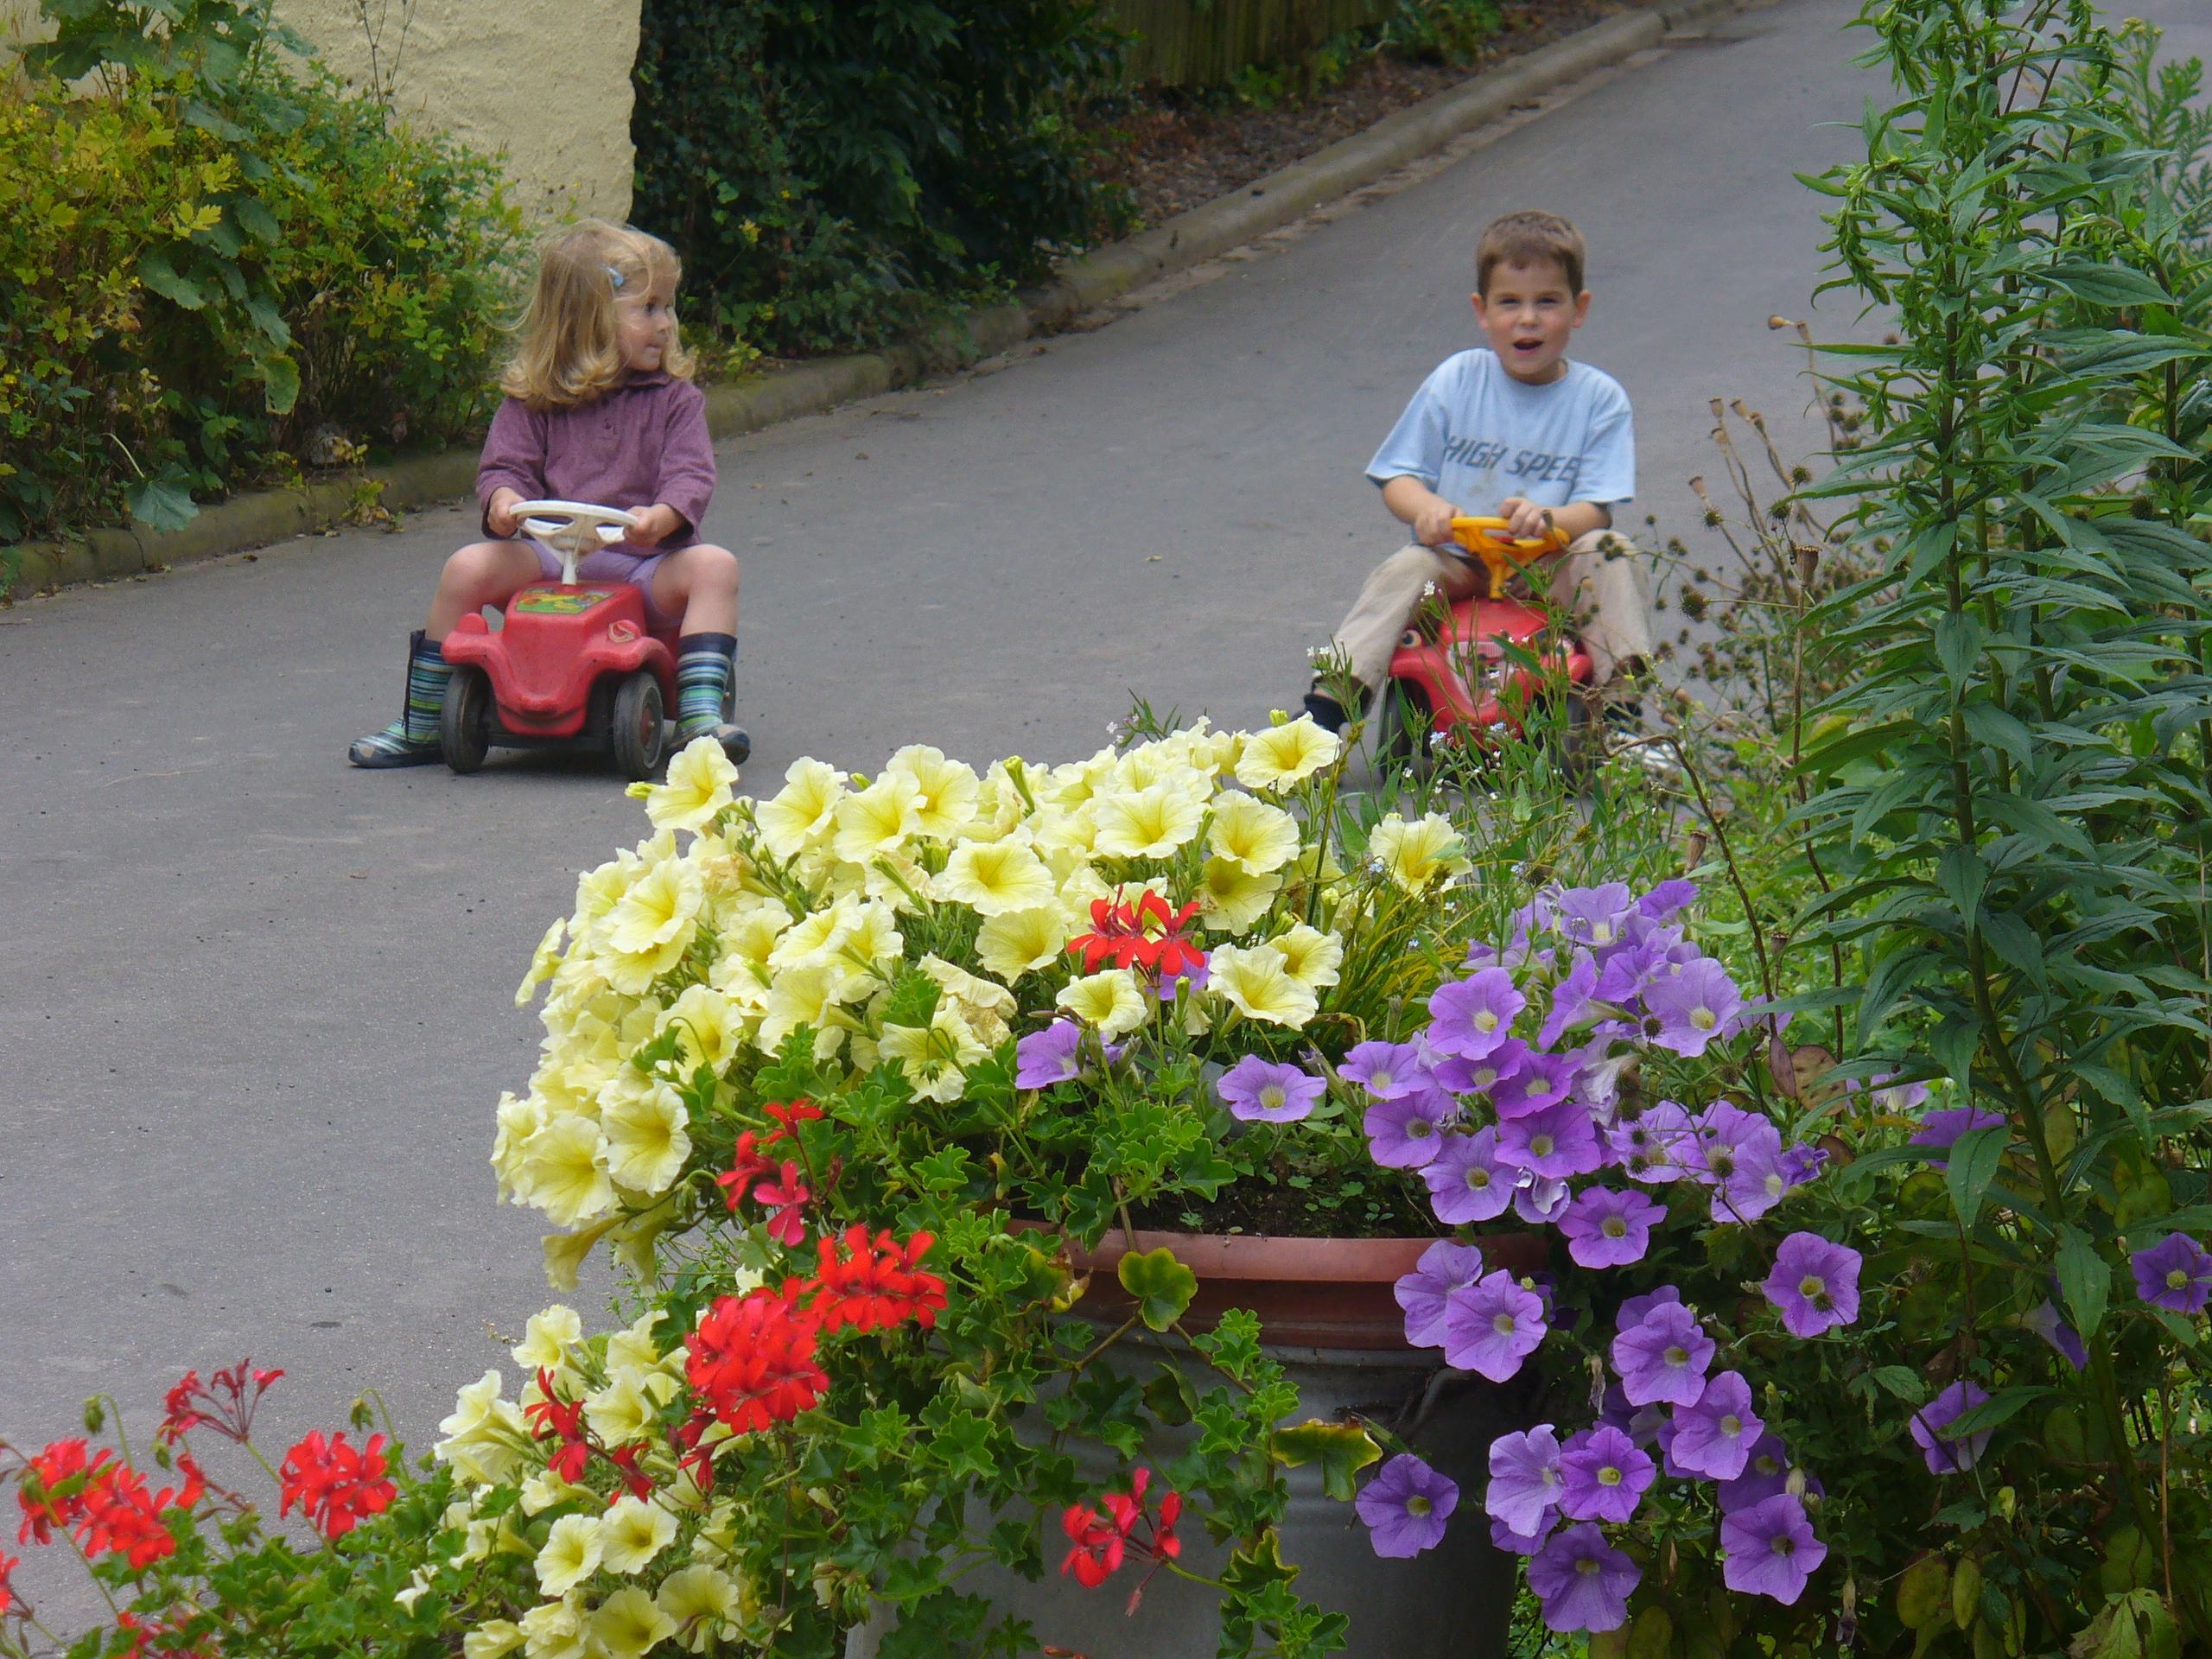 Bobycarrennen auf dem Mayischhof